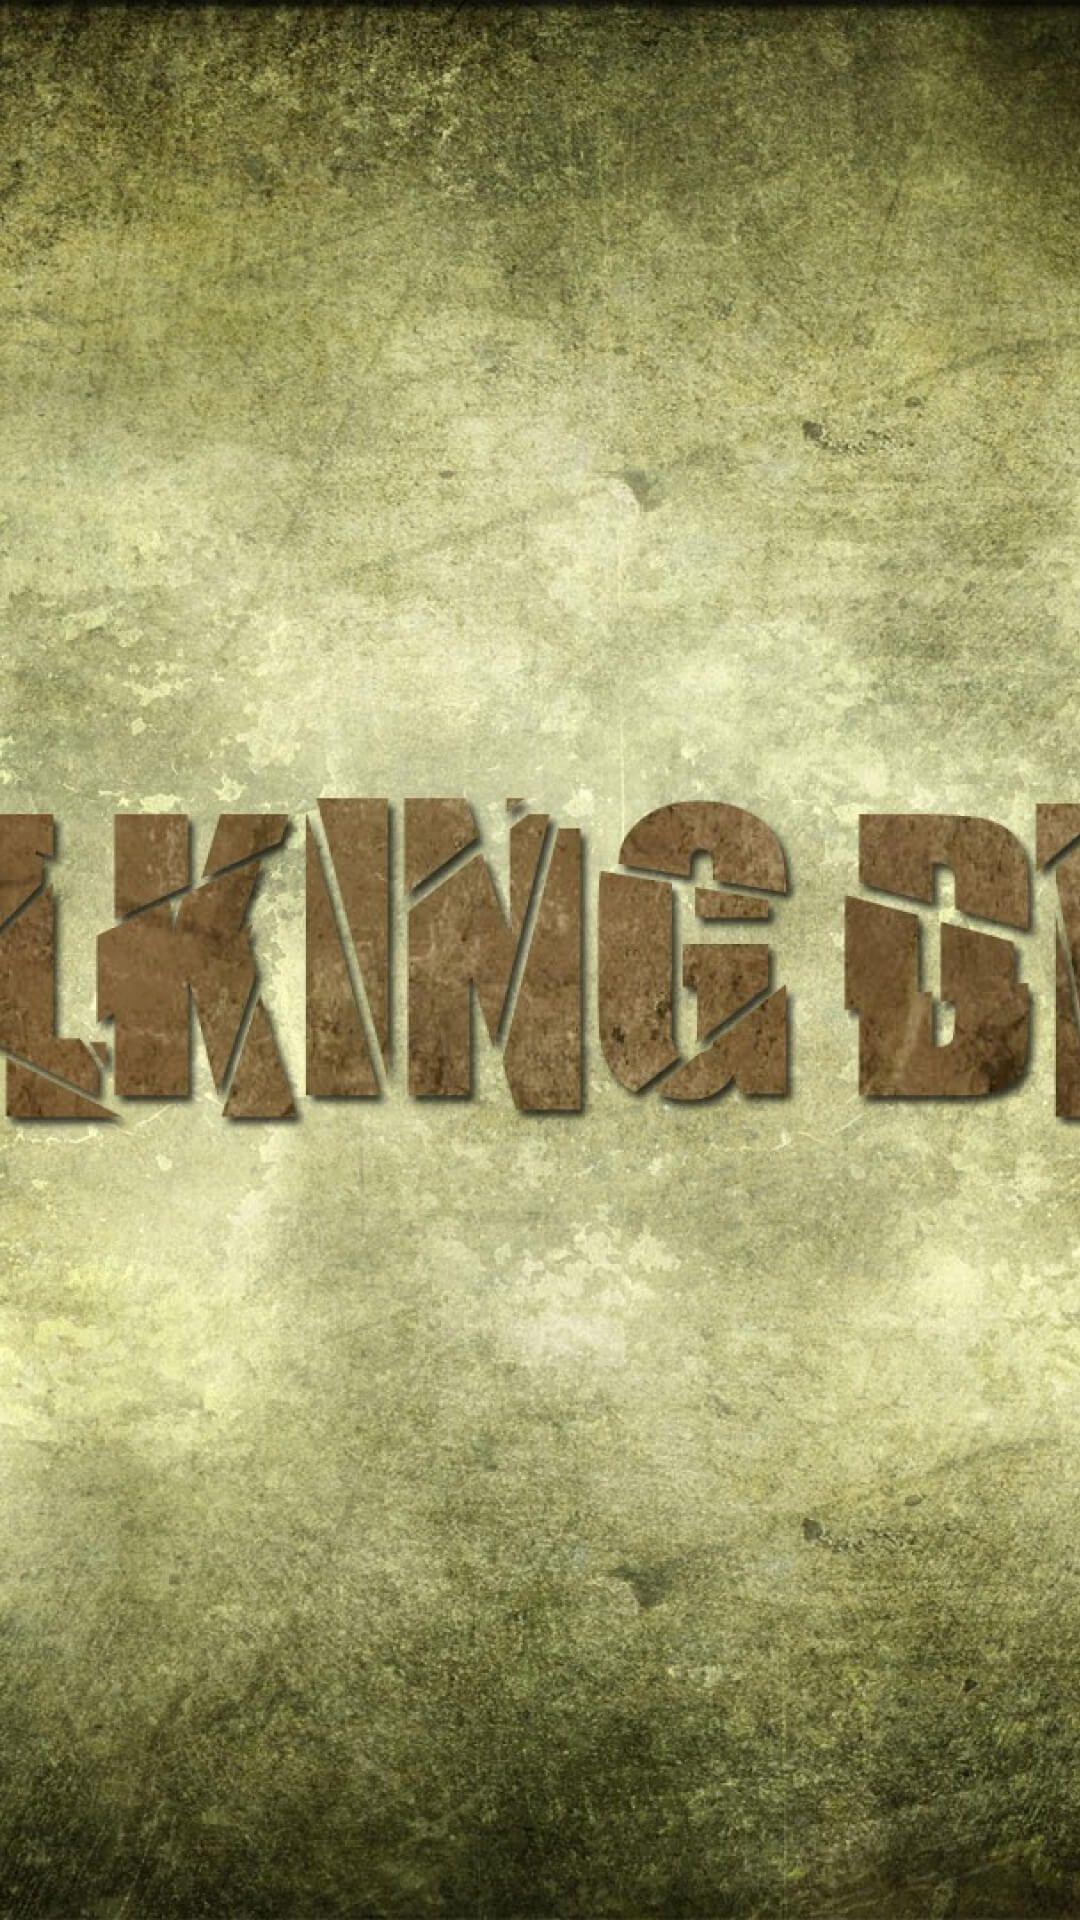 Fonds D Ecran Iphone Serie Tv The Walking Dead 04 Fond Ecran Iphone Fond Ecran Ecran Iphone